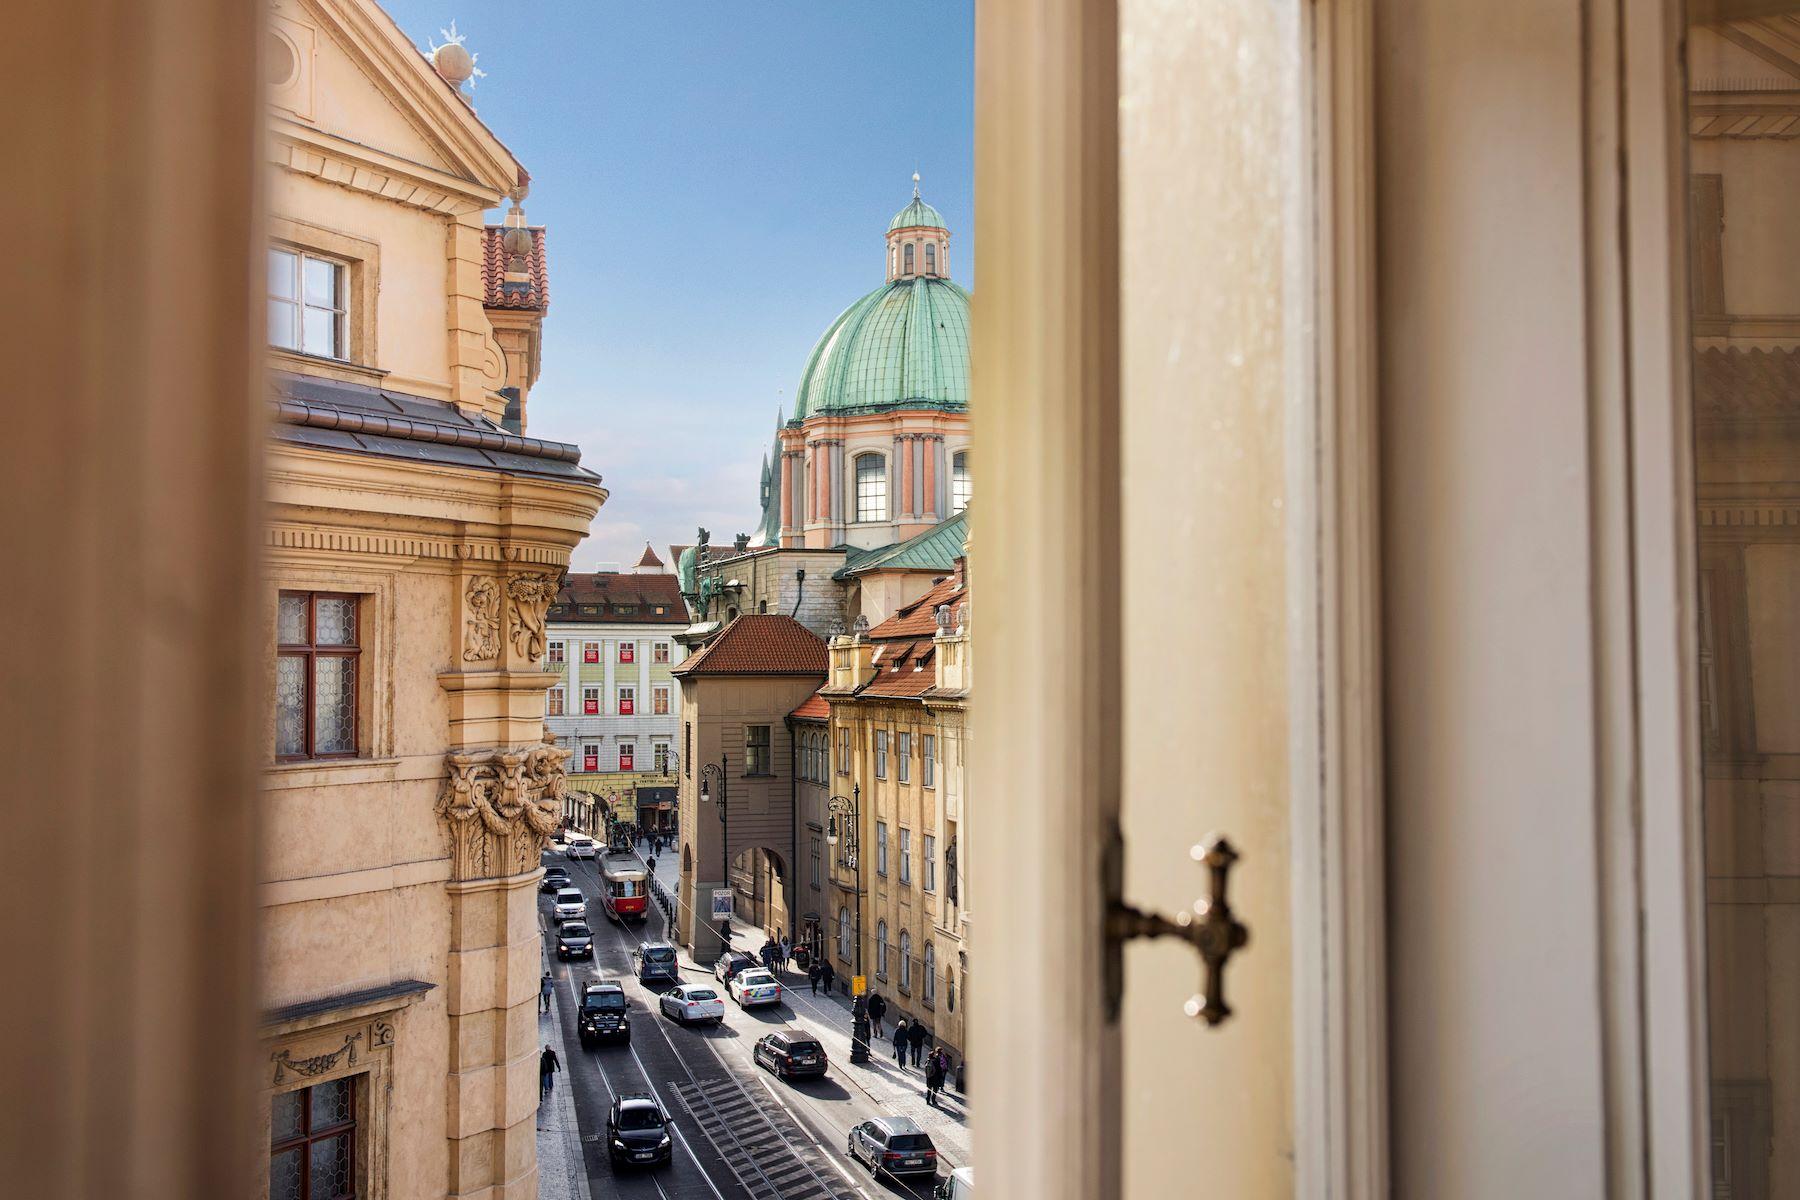 Квартира для того Продажа на Old Town apartment in an attractive city center Platnerska 7 Prague, Прага, 11000 Чешская Республика